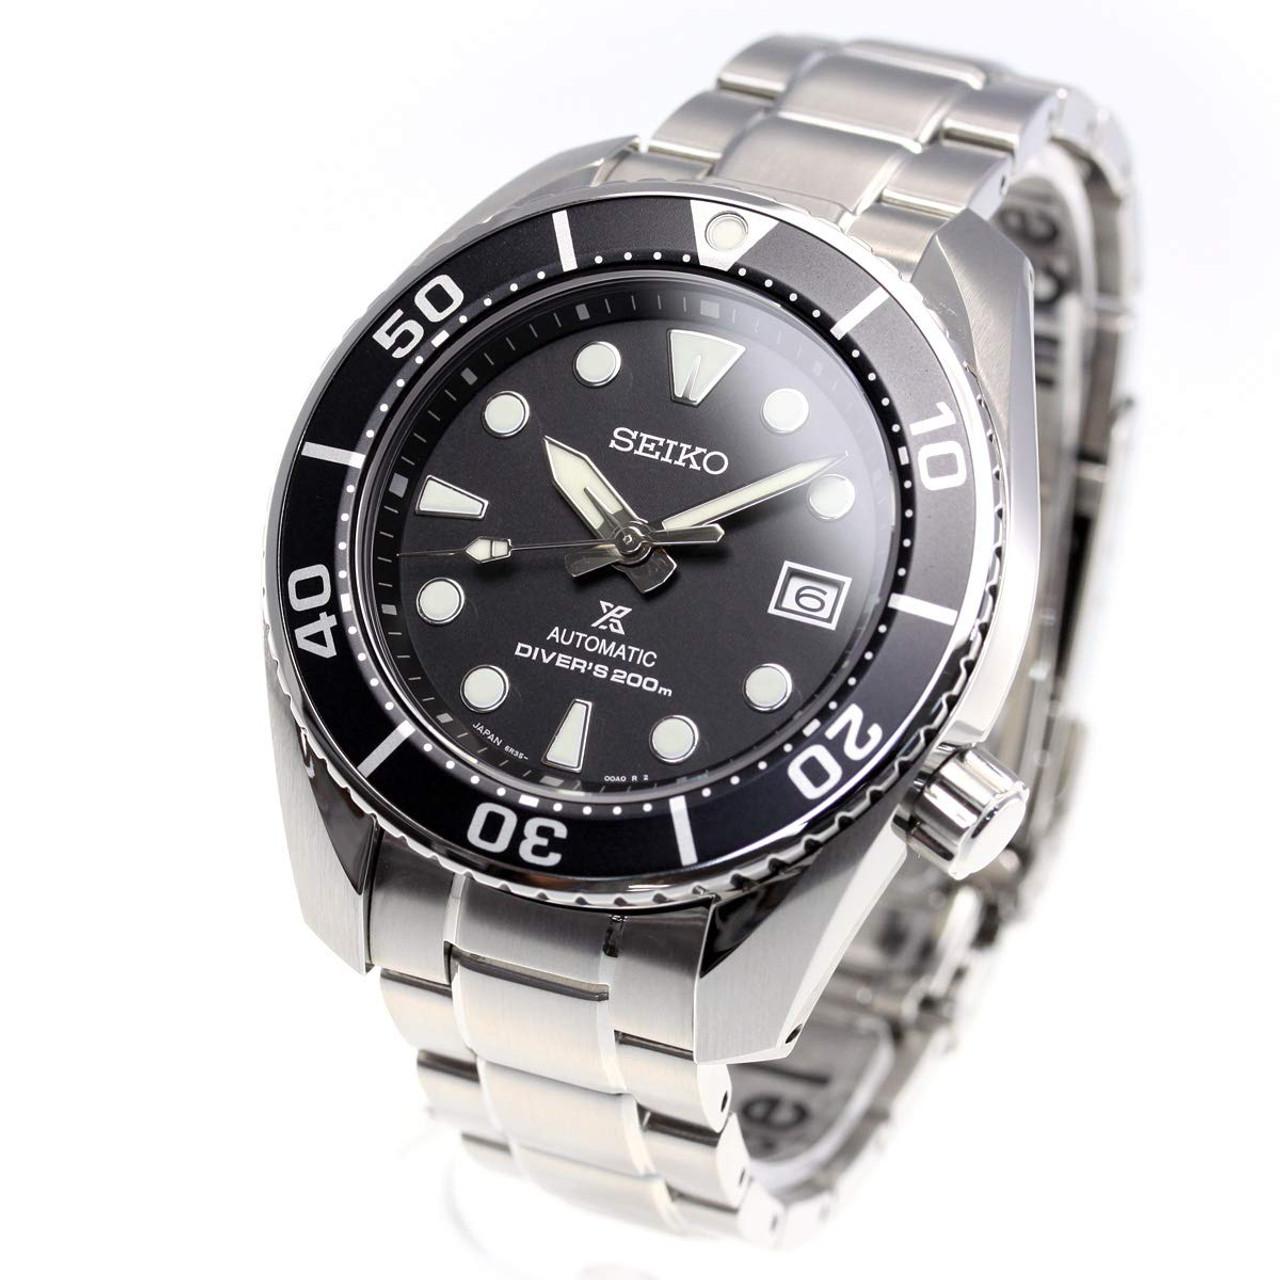 Seiko Automatic Diver 200m Silver Watch